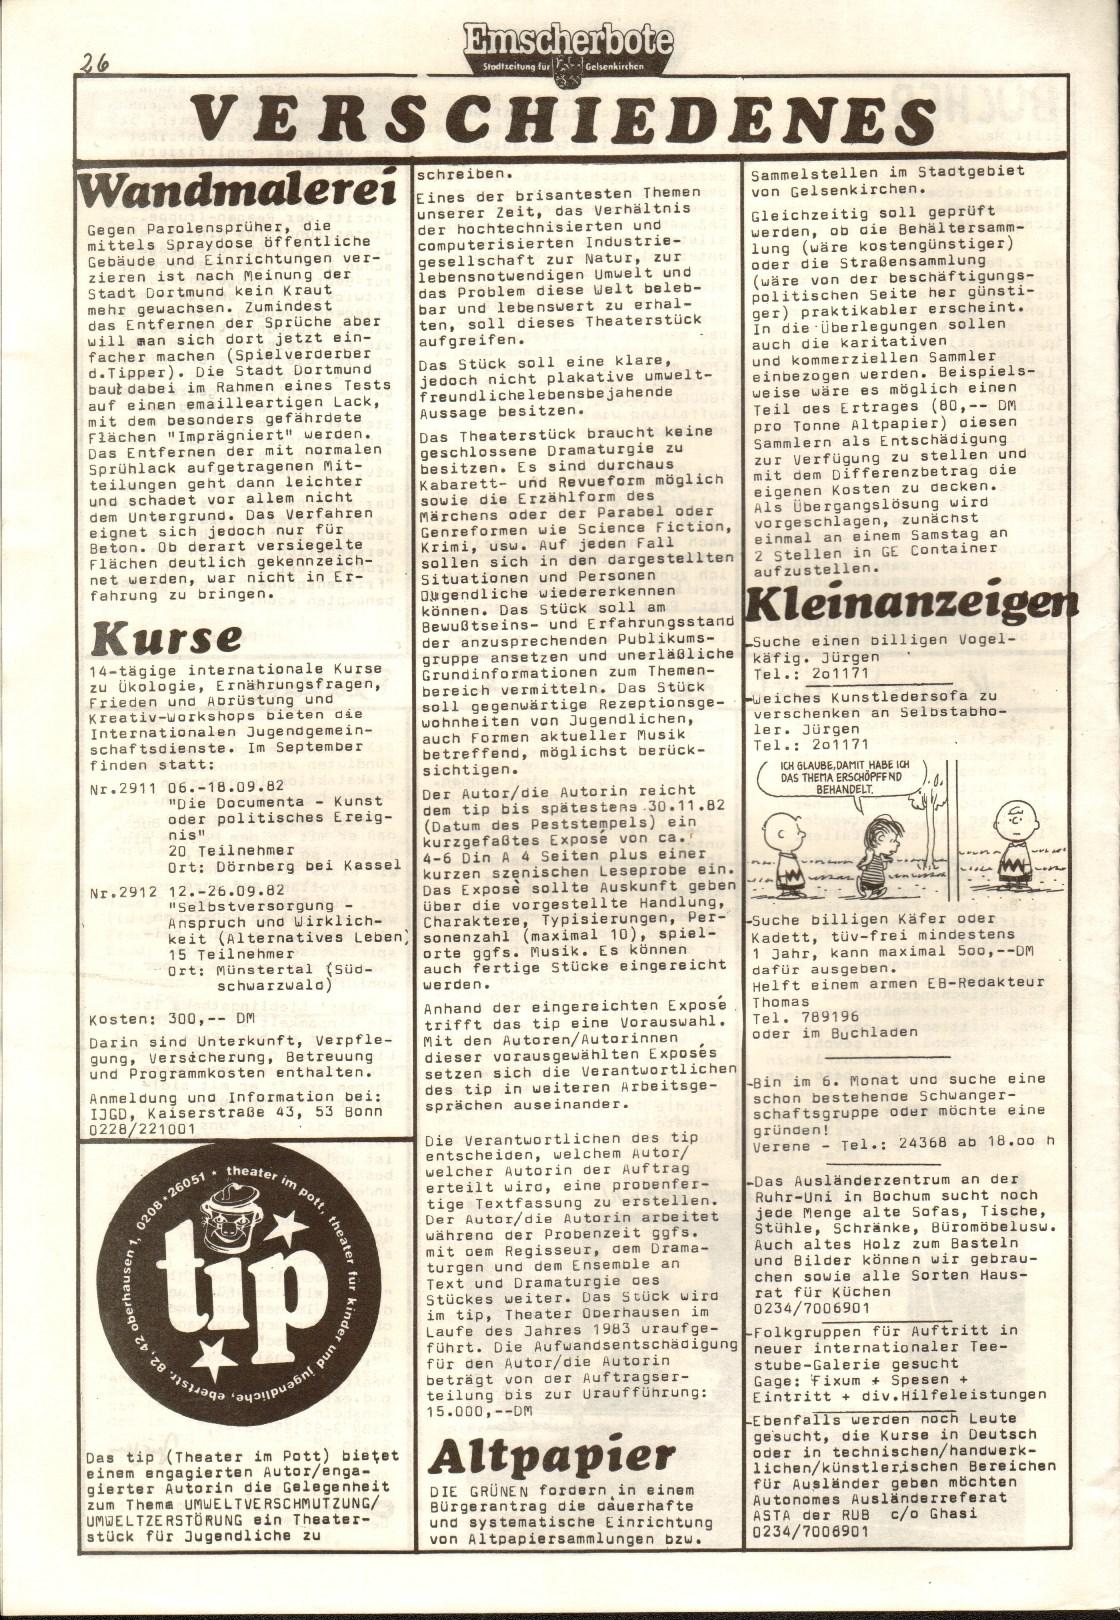 Gelsenkirchen_Emscherbote_1982_20_26